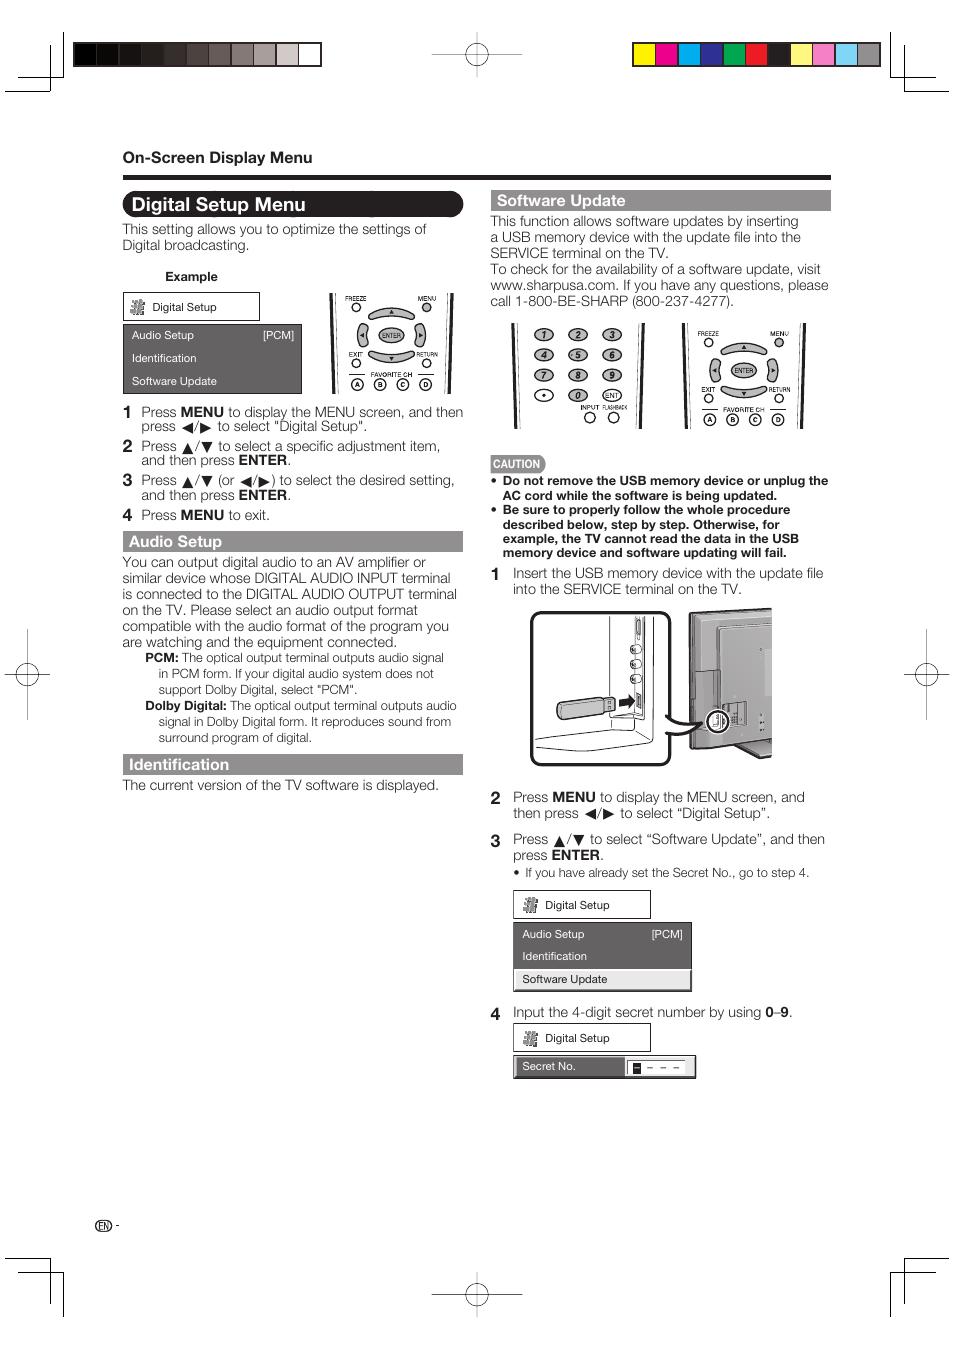 Digital setup menu, Audio setup, Identification | Sharp